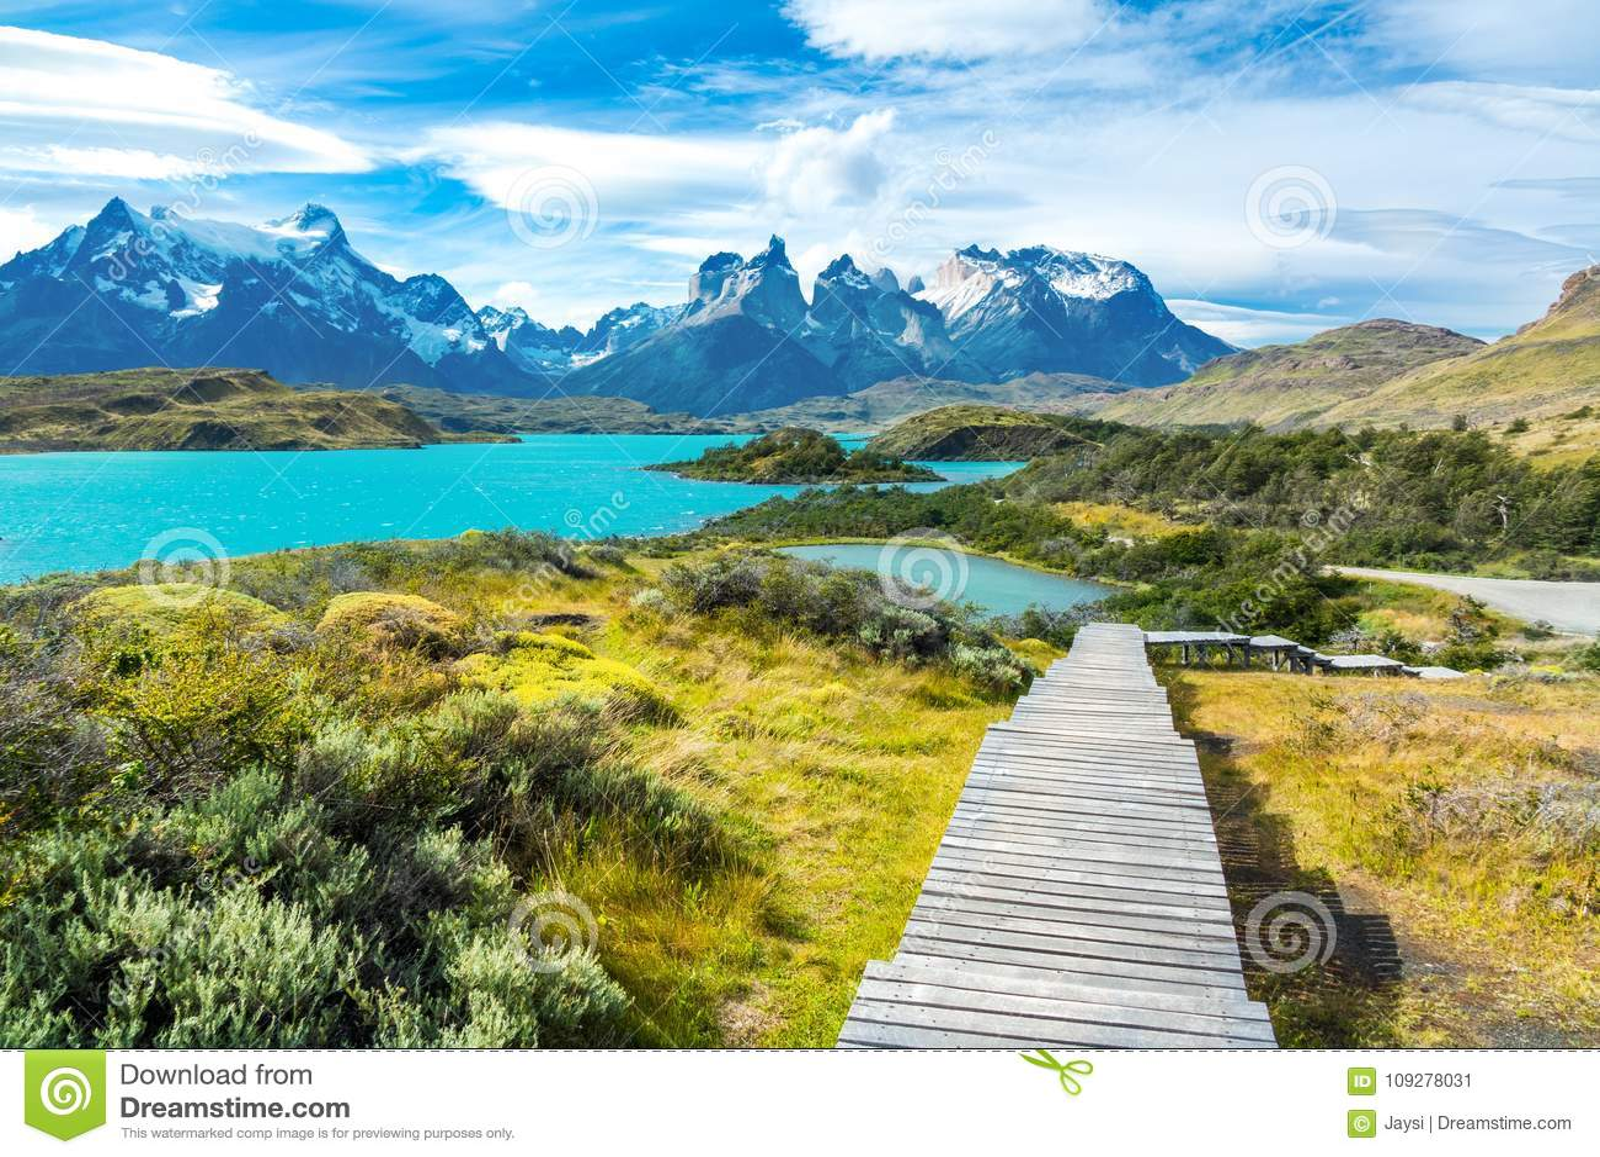 Pehoe sjö och Guernos berglandskap, nationalpark Torres del Paine, Patagonia, Chile, Sydamerika